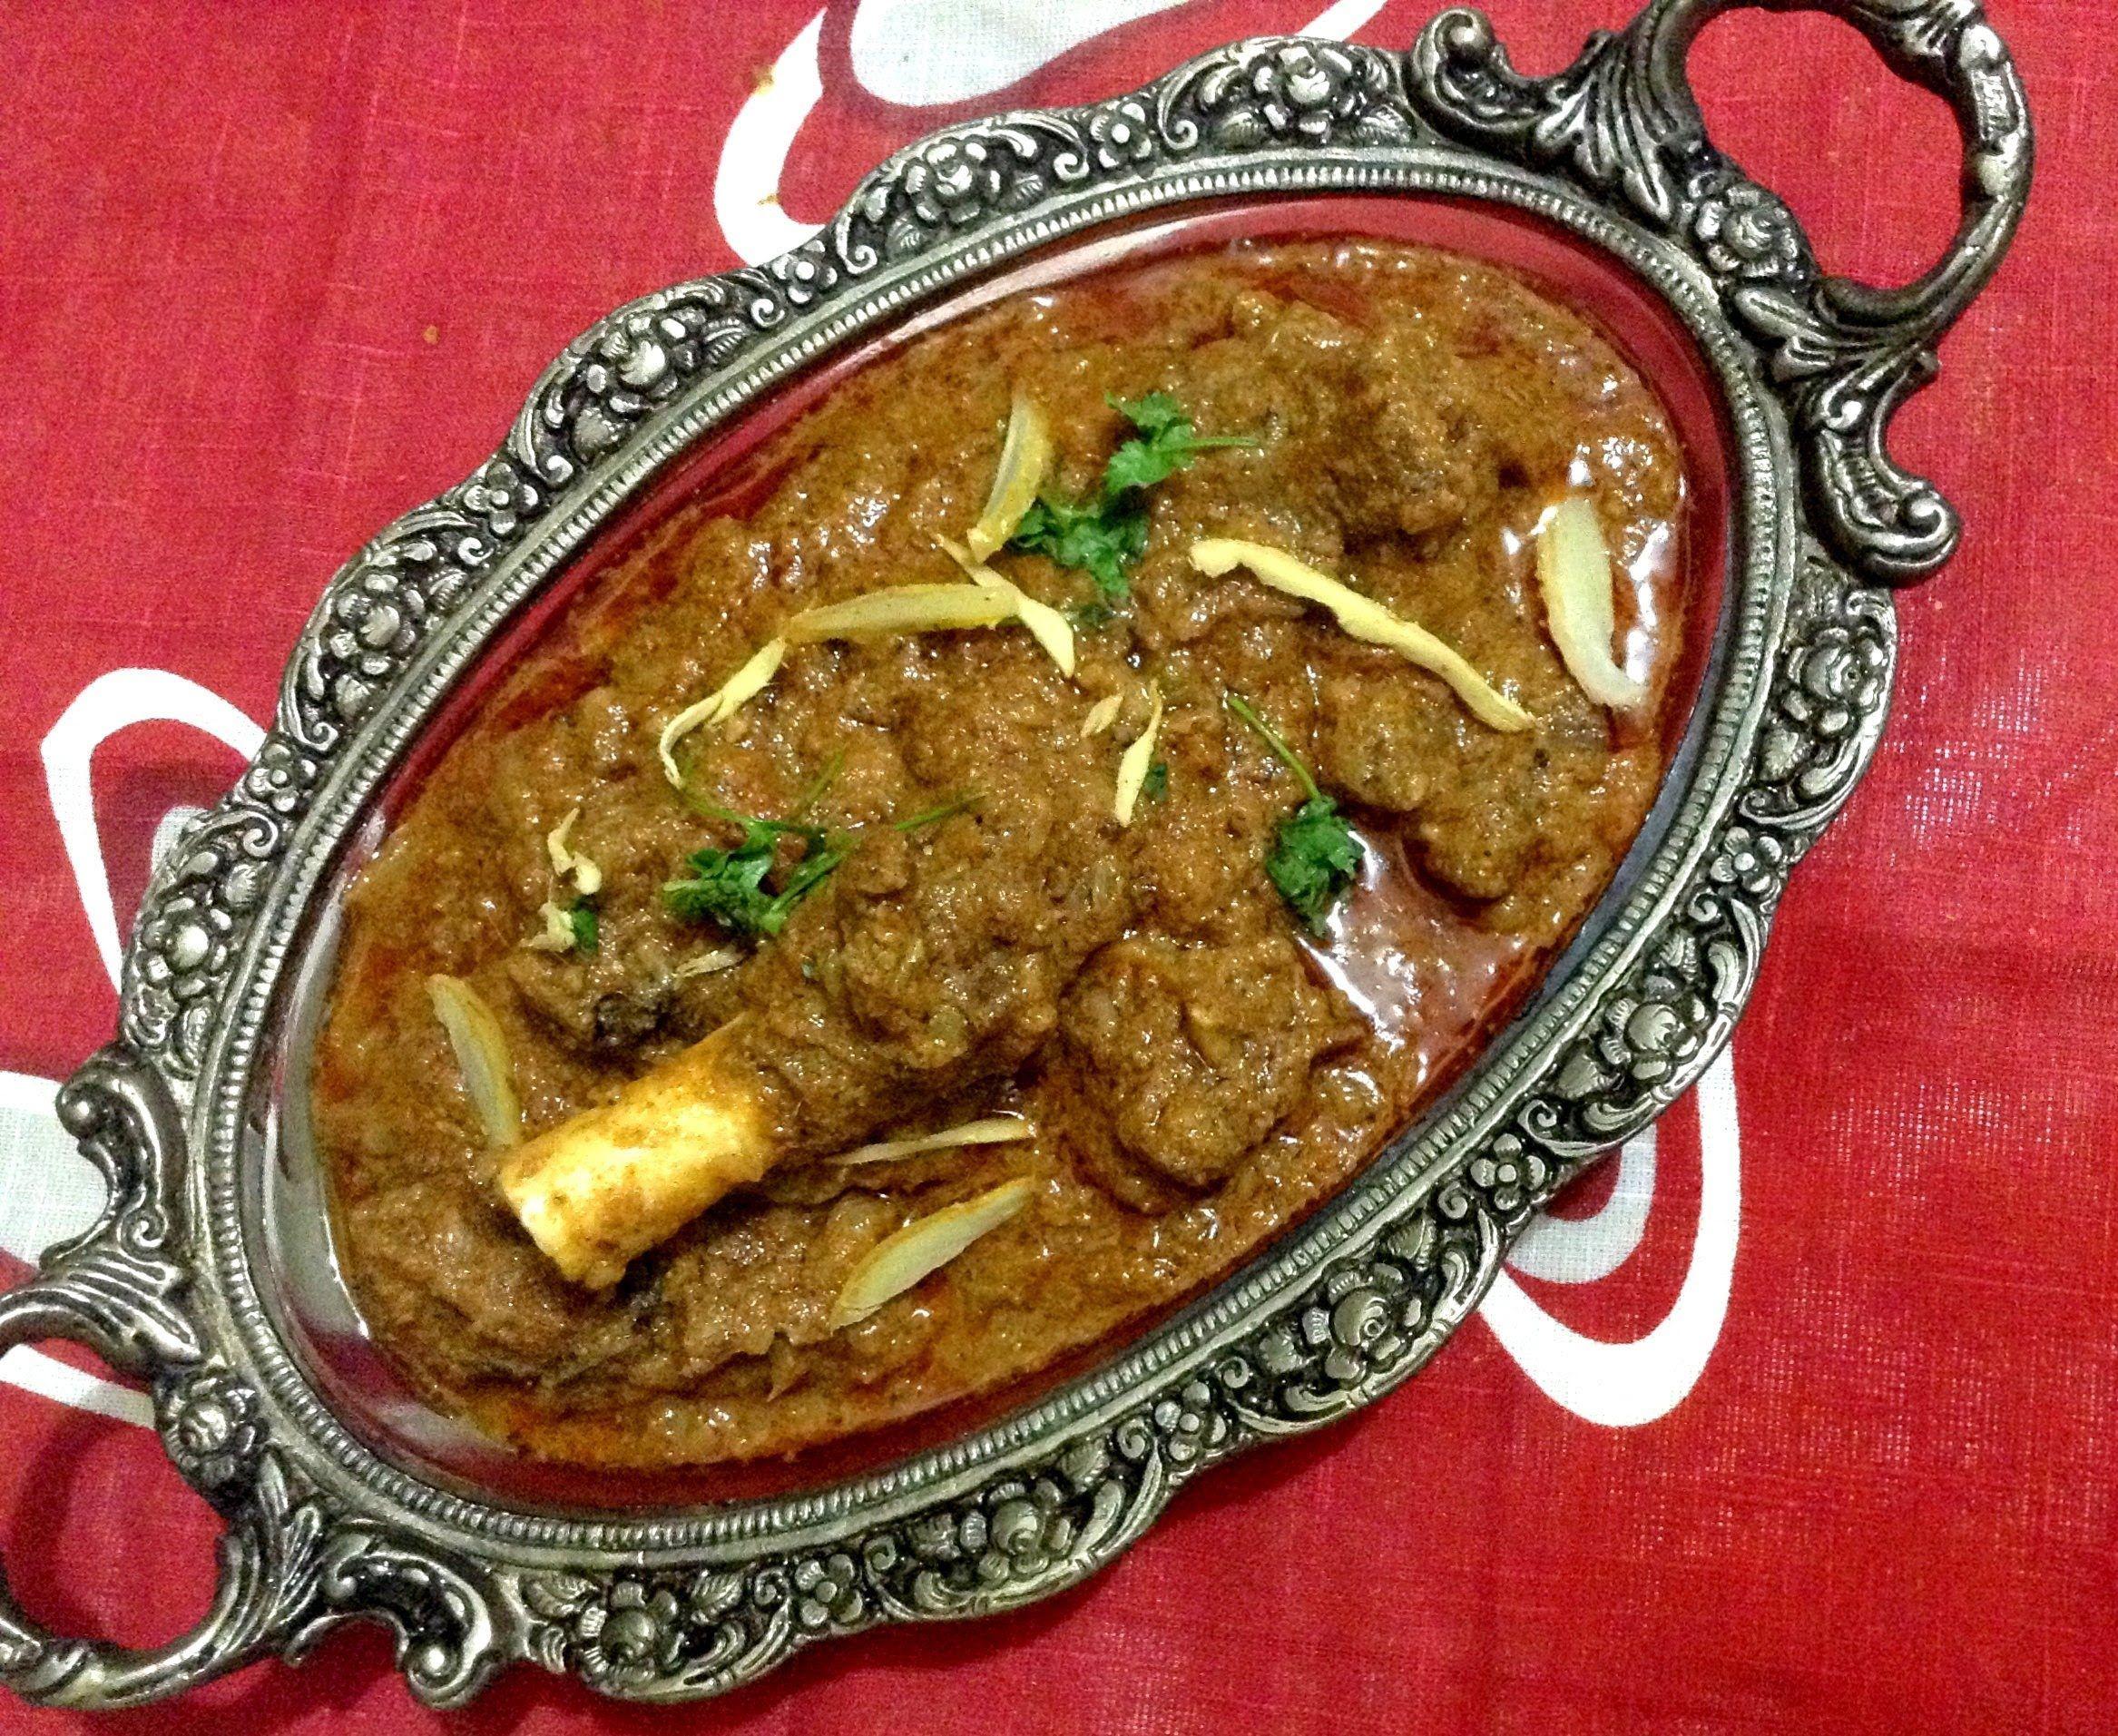 Restaurant style irani gosht dry mutton recipe by chef shaheen restaurant style irani gosht dry mutton recipe by chef shaheen forumfinder Gallery